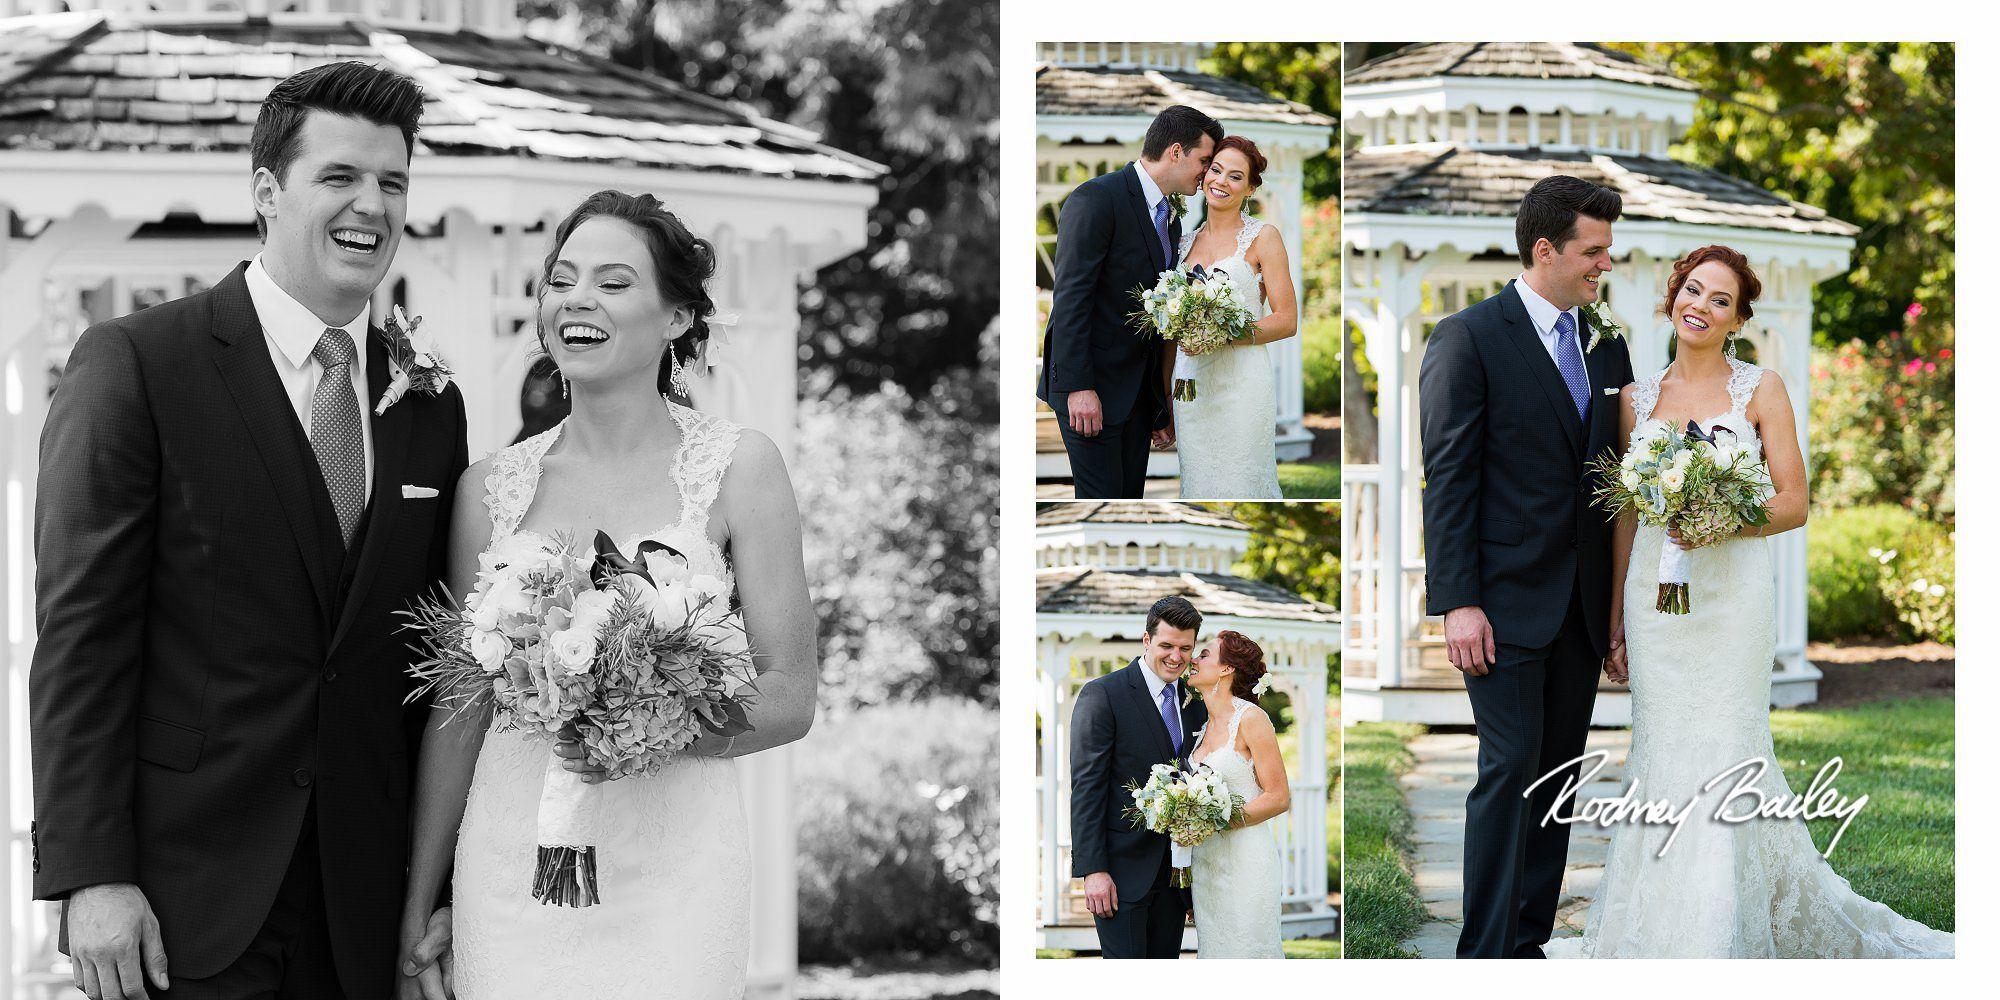 Rosemont Manor Va Weddings Wedding Photographers Venue Reception Ceremony Fls Bridal Gown